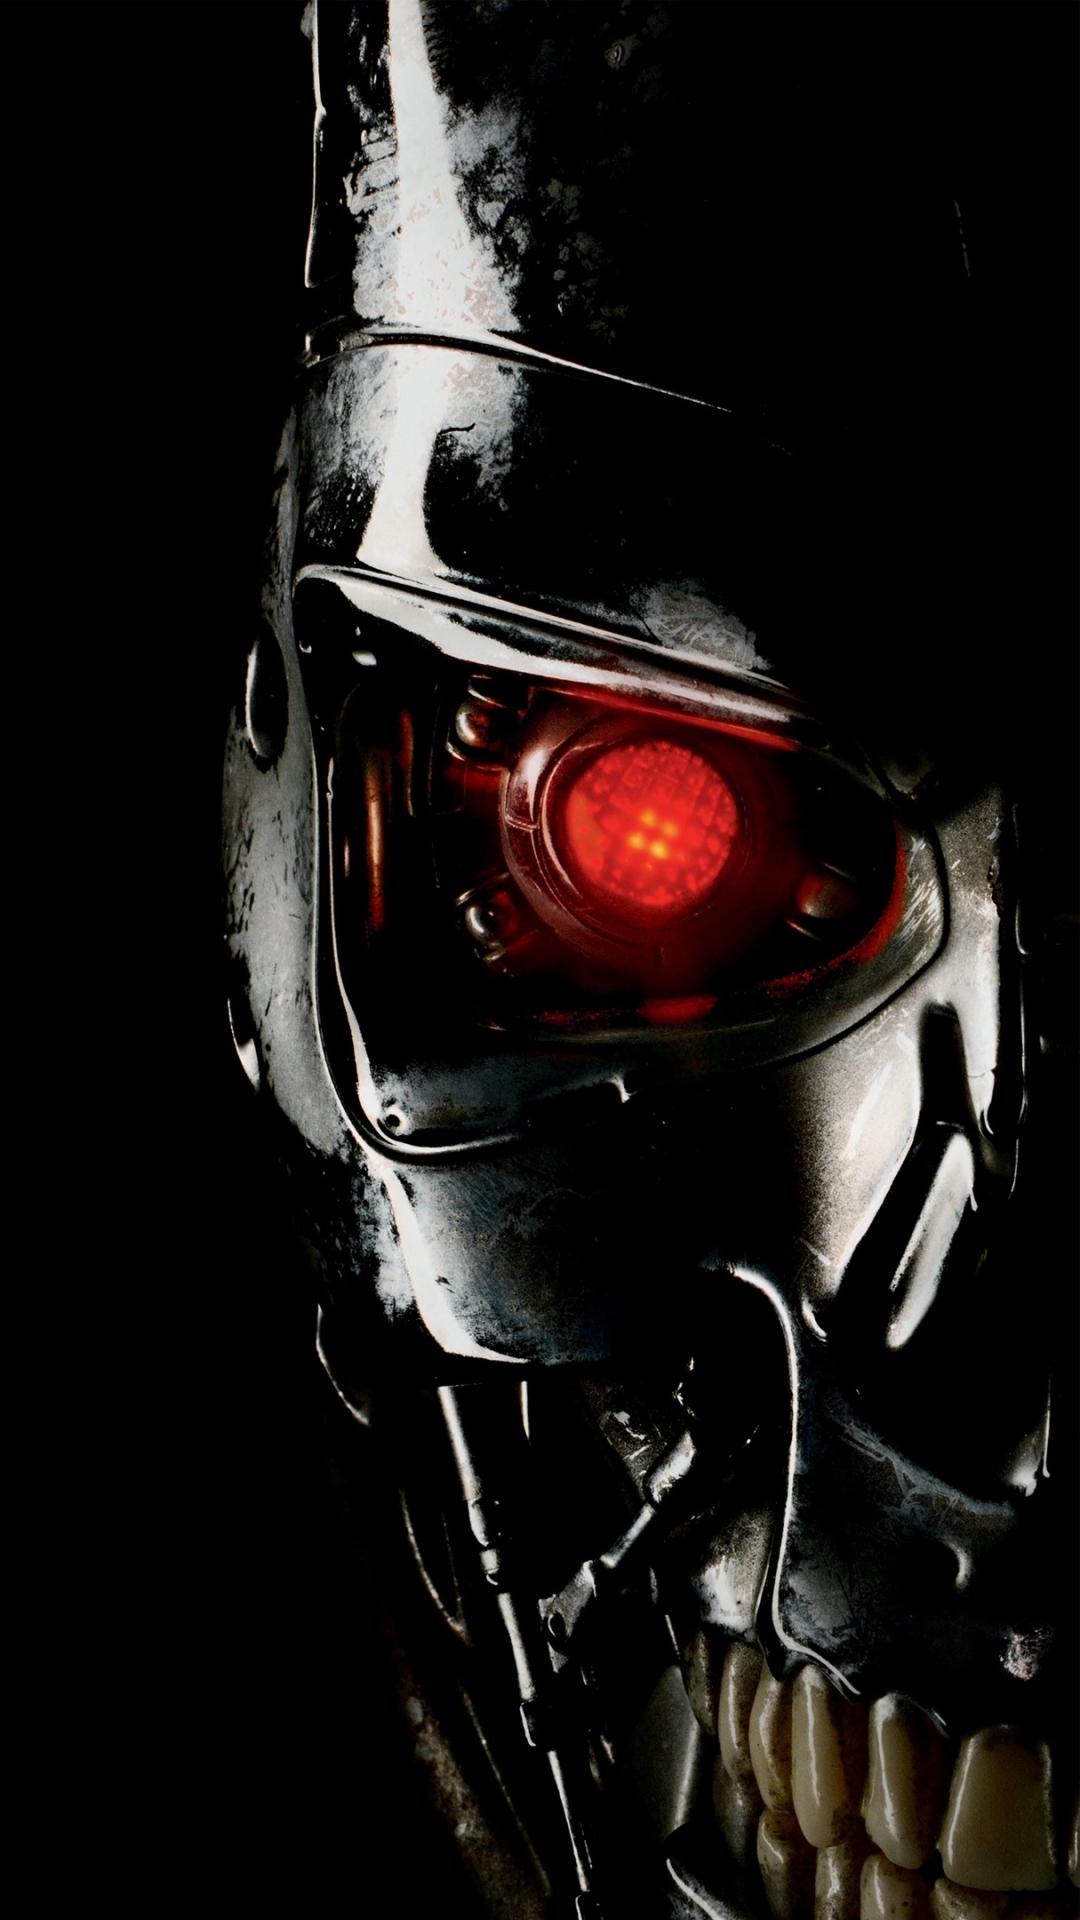 Wallpaper terminator salvation - Terminator 2 wallpaper hd ...